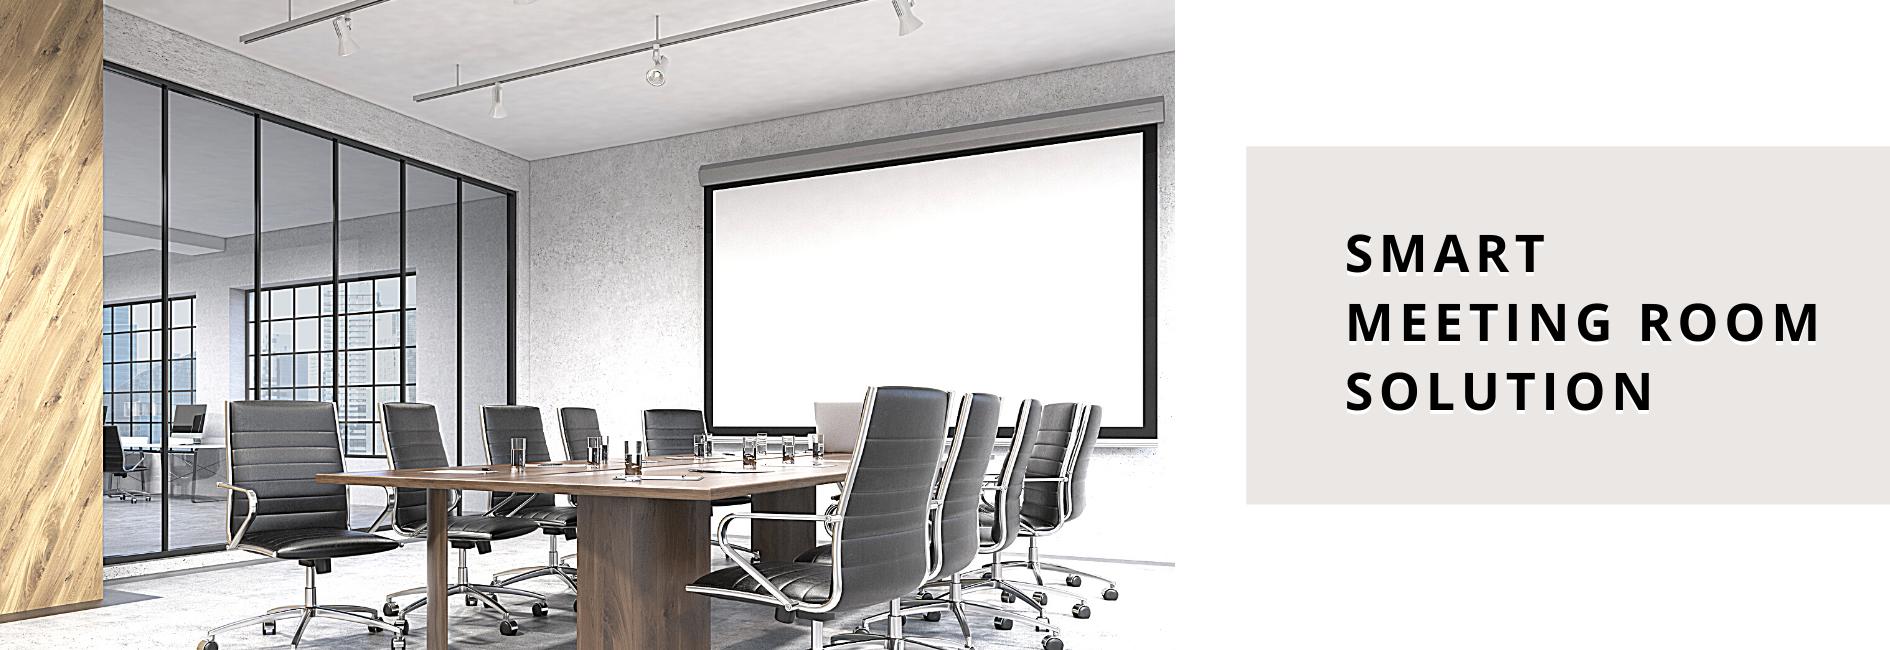 Smart Meeting Room Solution